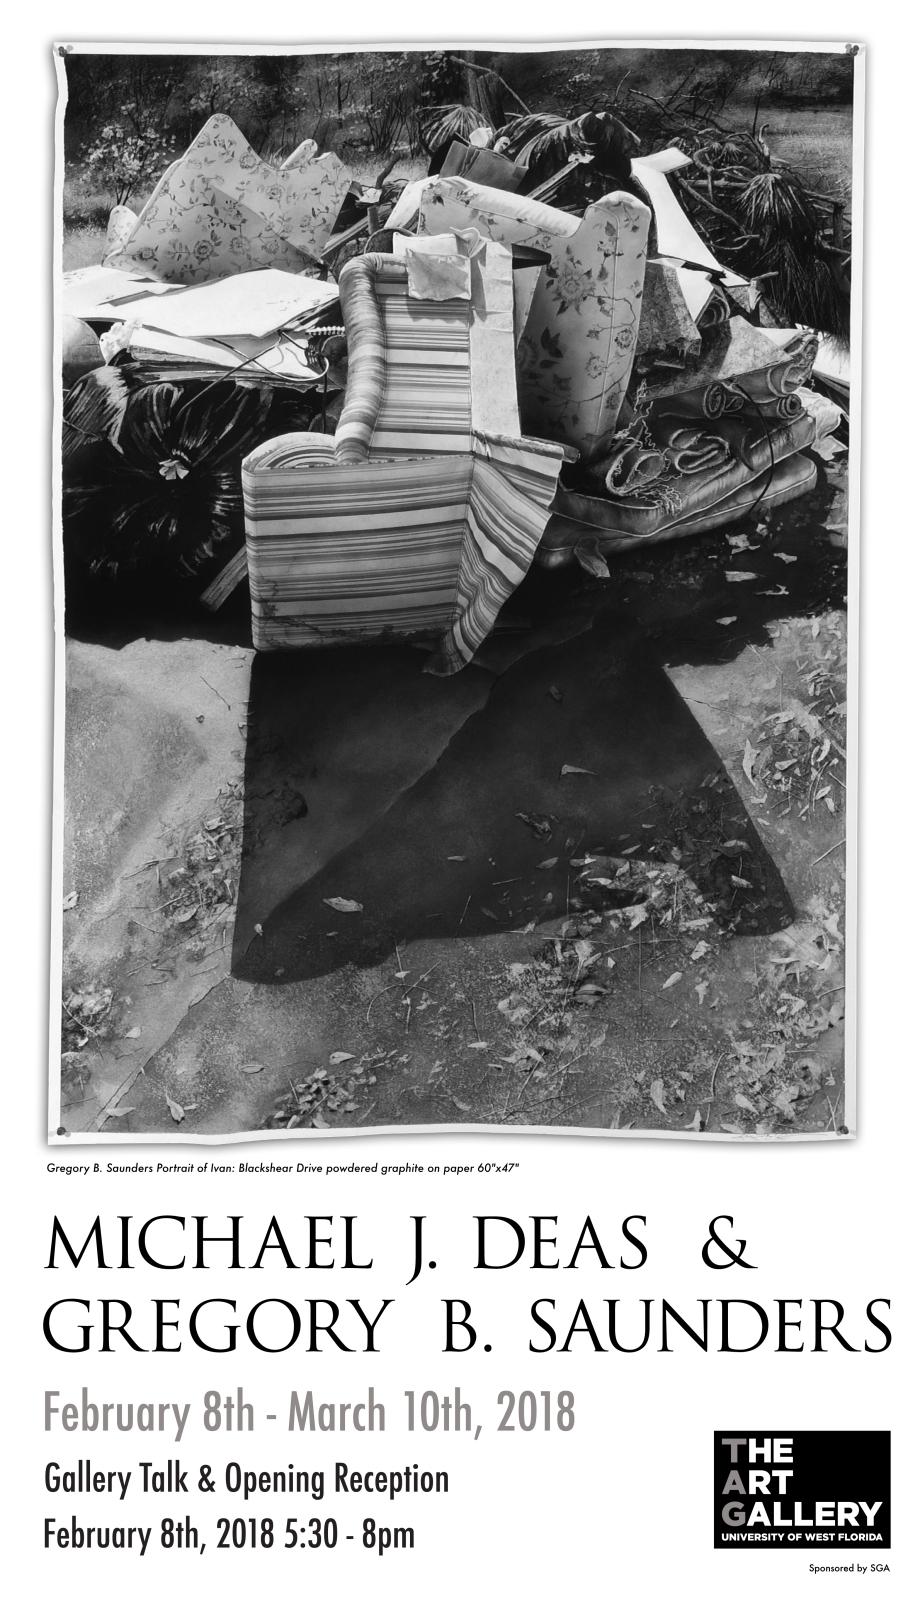 deas poster-02